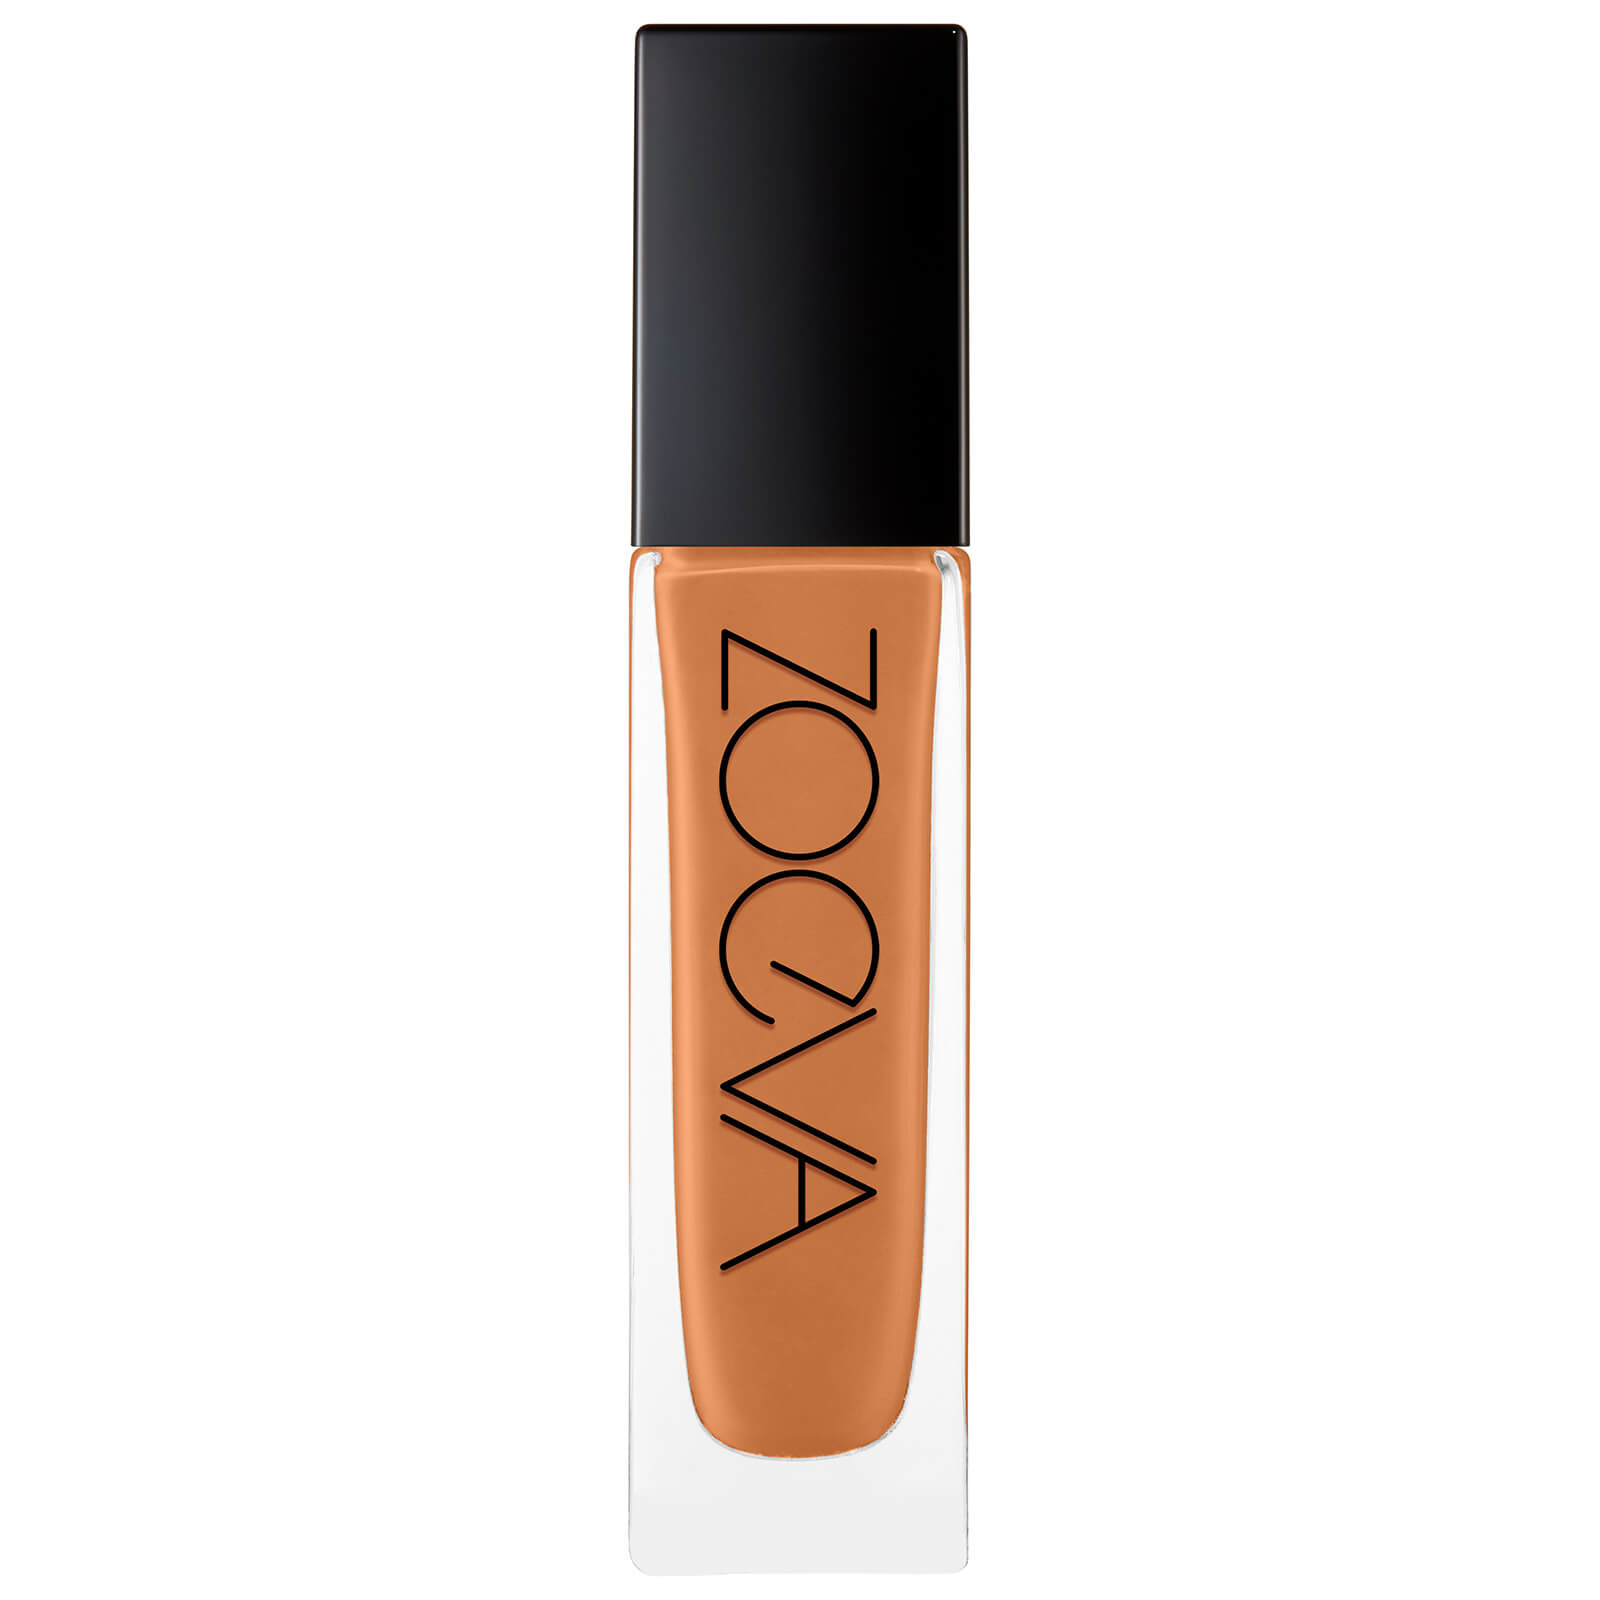 ZOEVA Authentik Skin Foundation 30ml (Various Shades) - 280N Honour